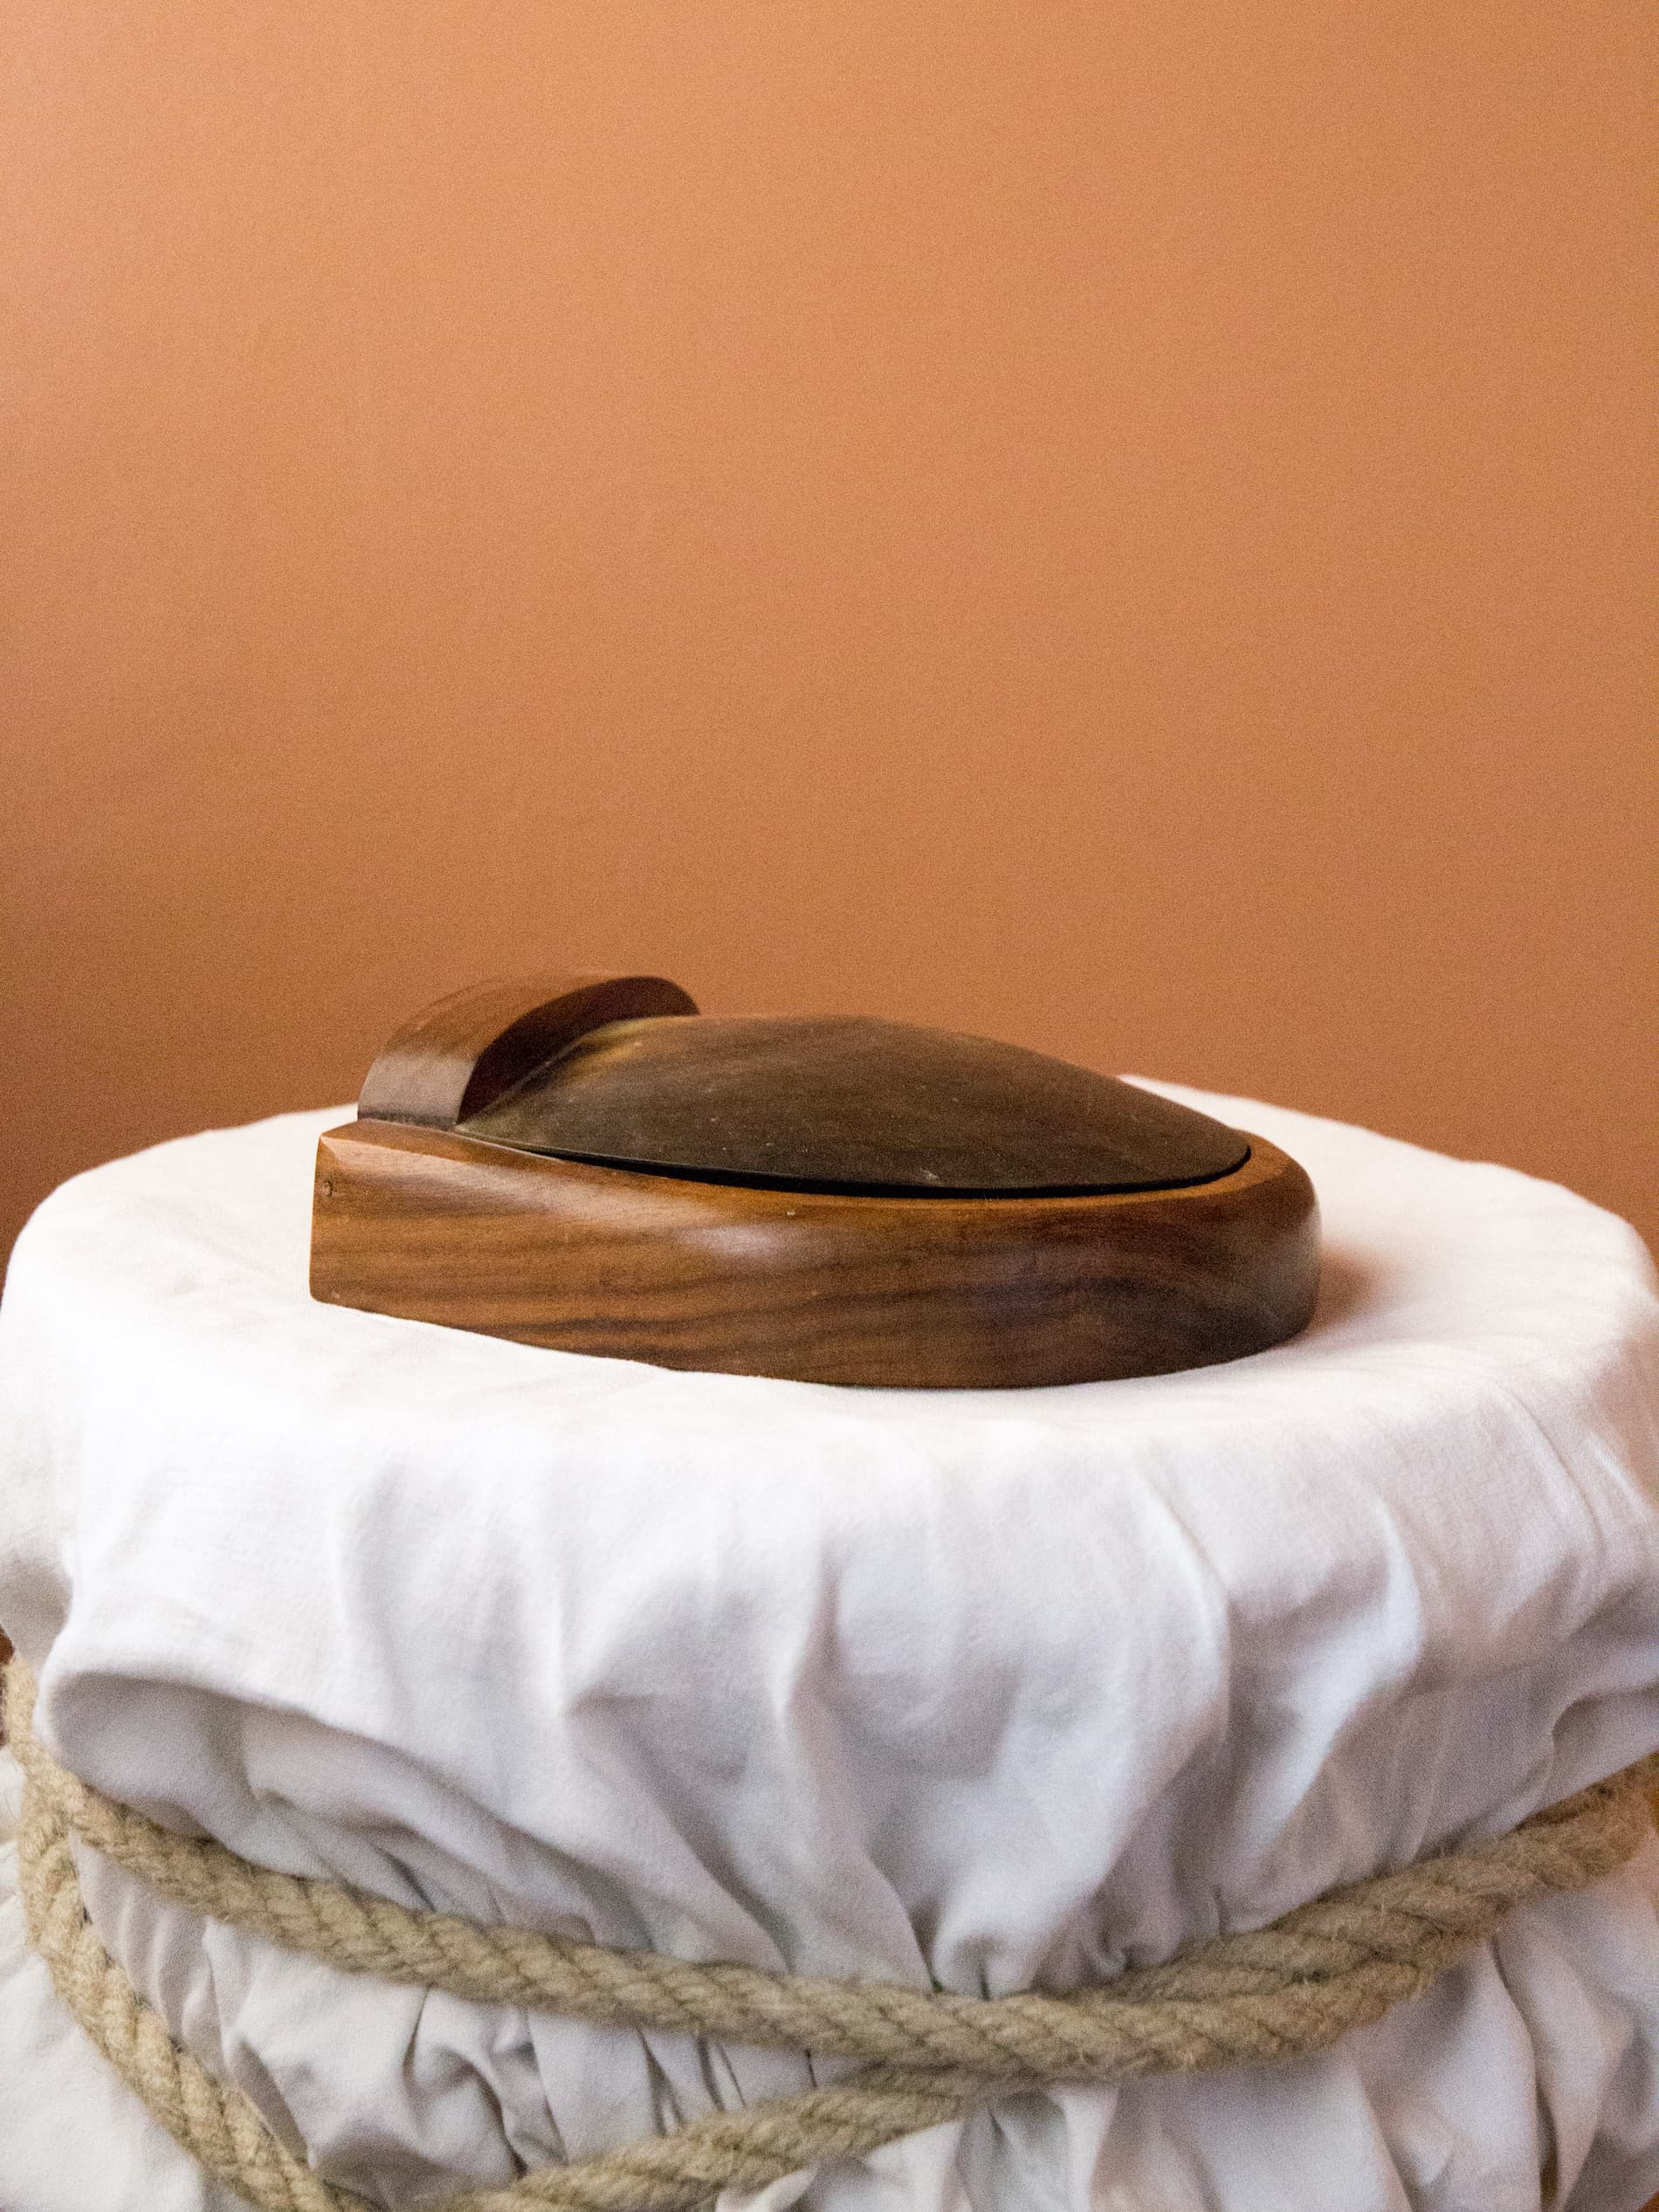 Wood & shell trinket box, 50's